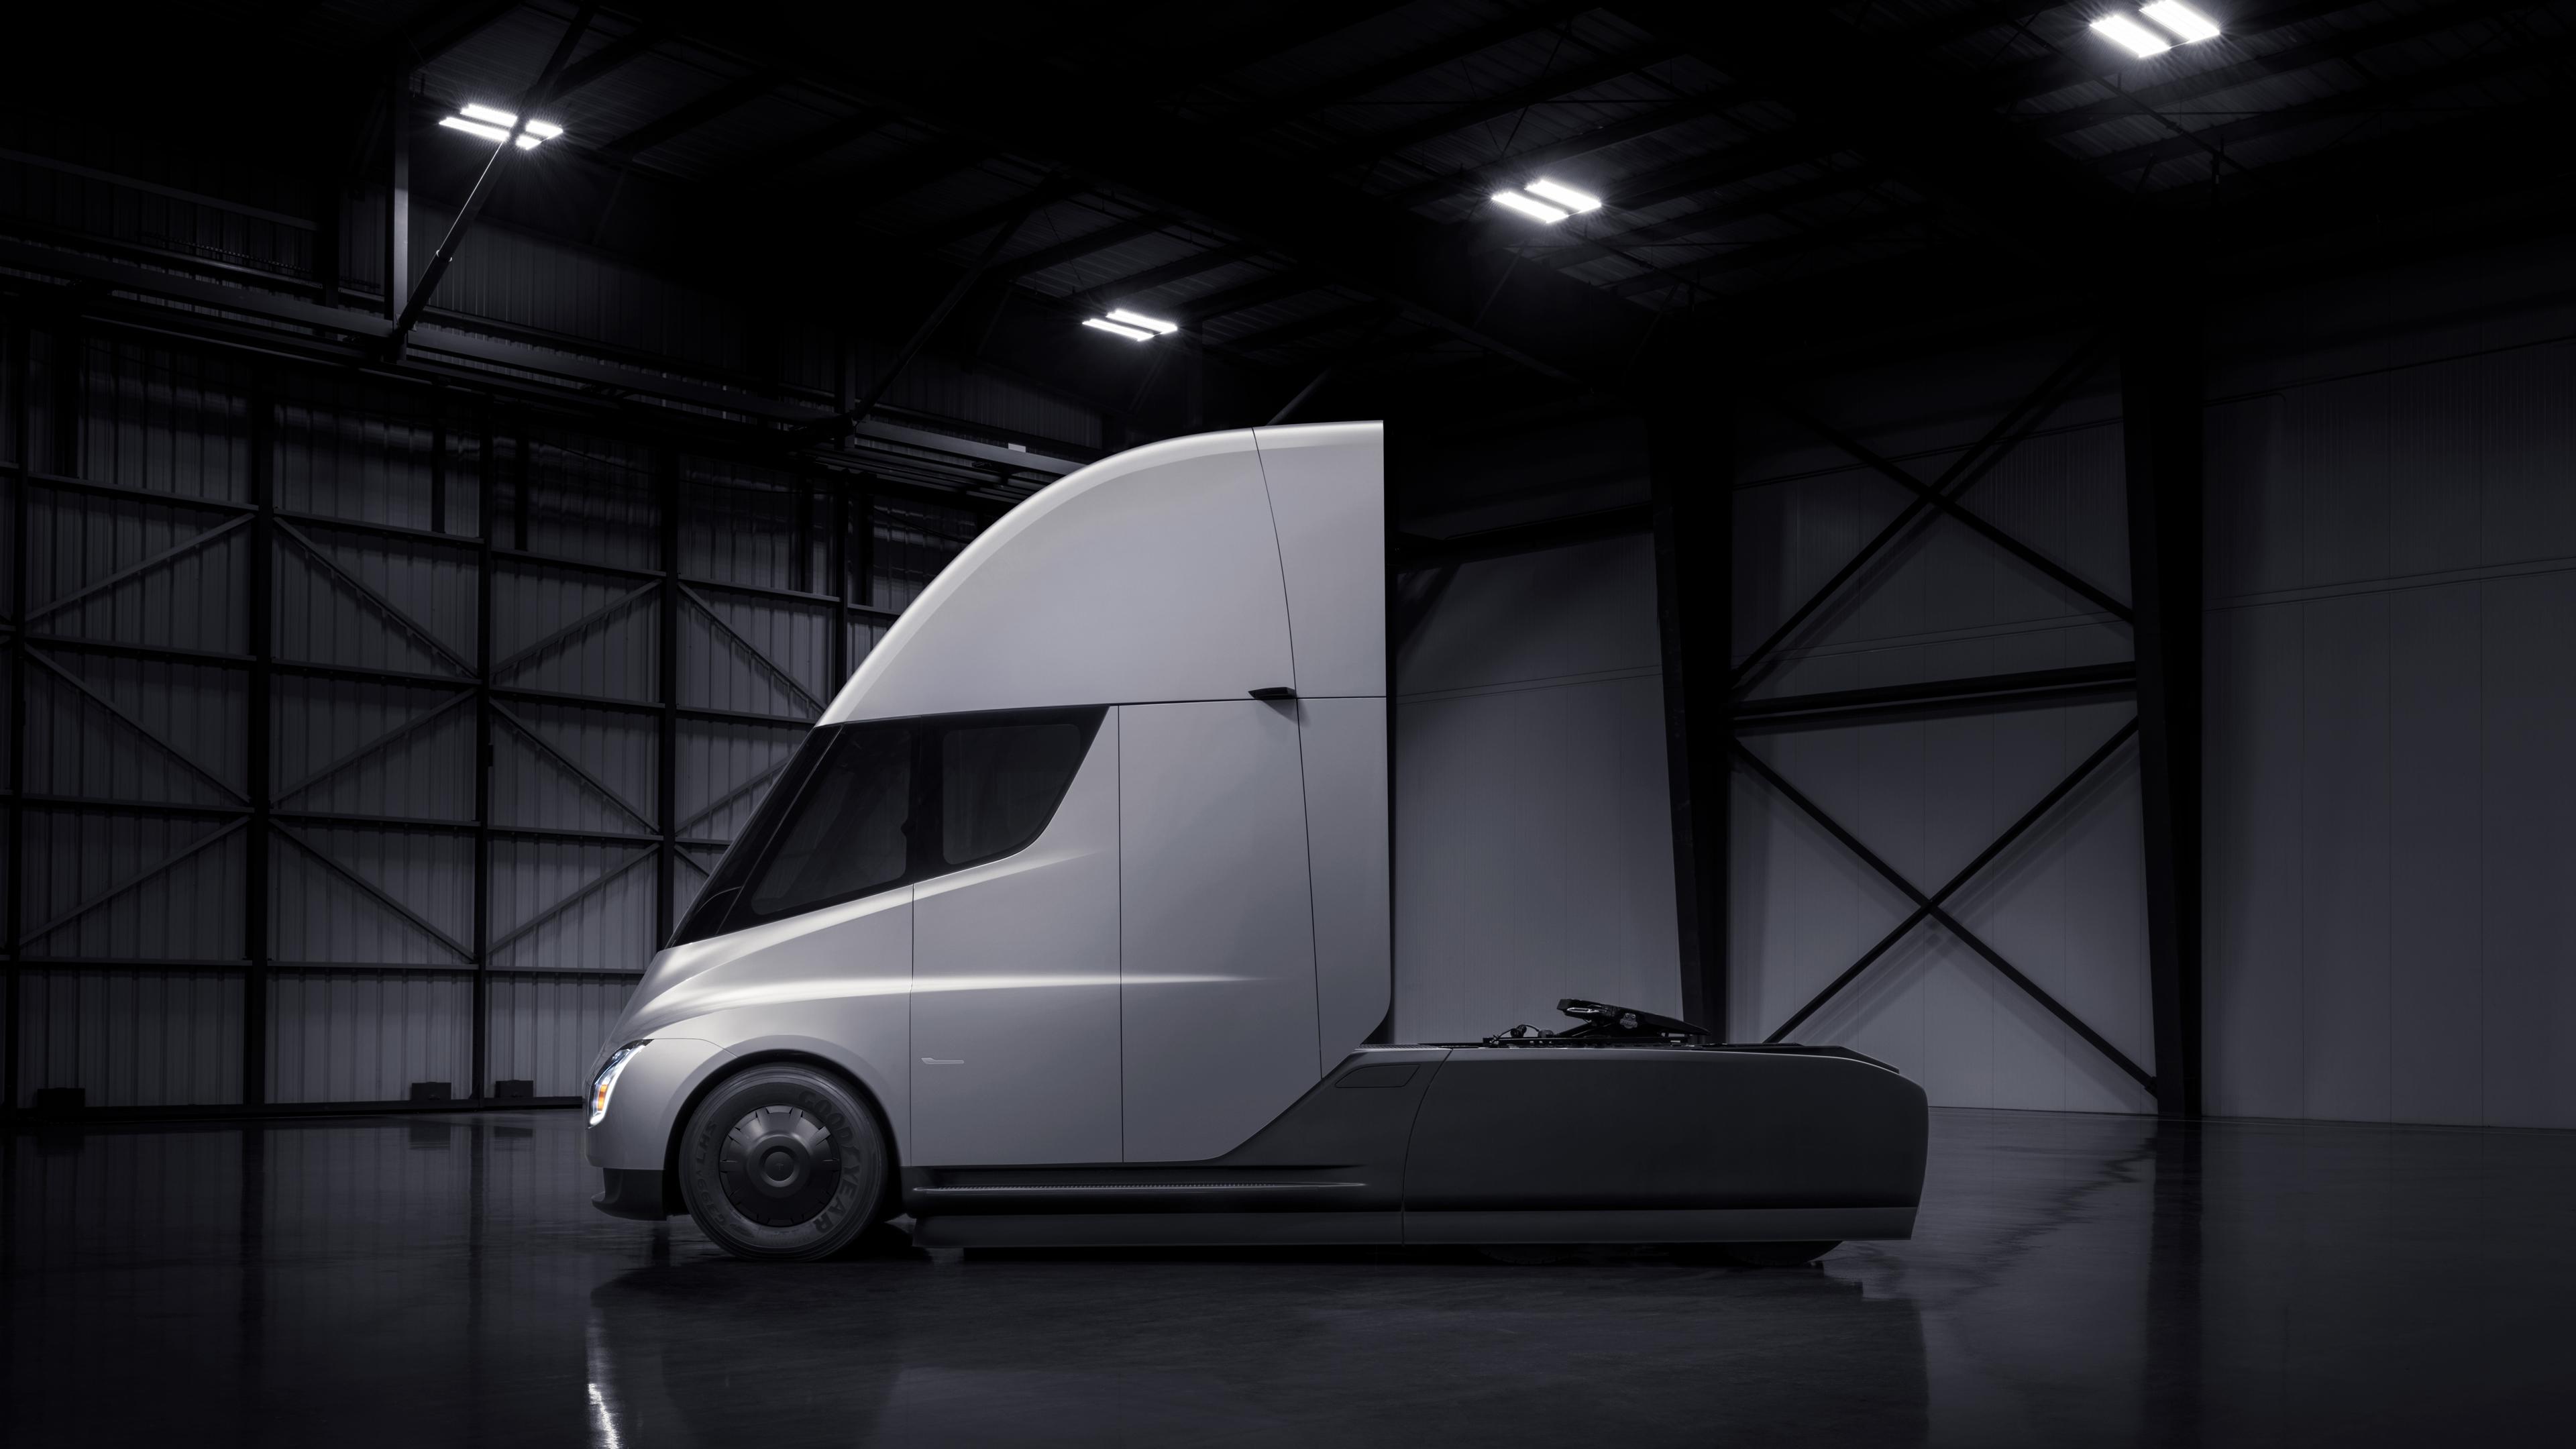 Pepsi one-ups Budweiser brewer by ordering 100 Tesla electric semi trucks